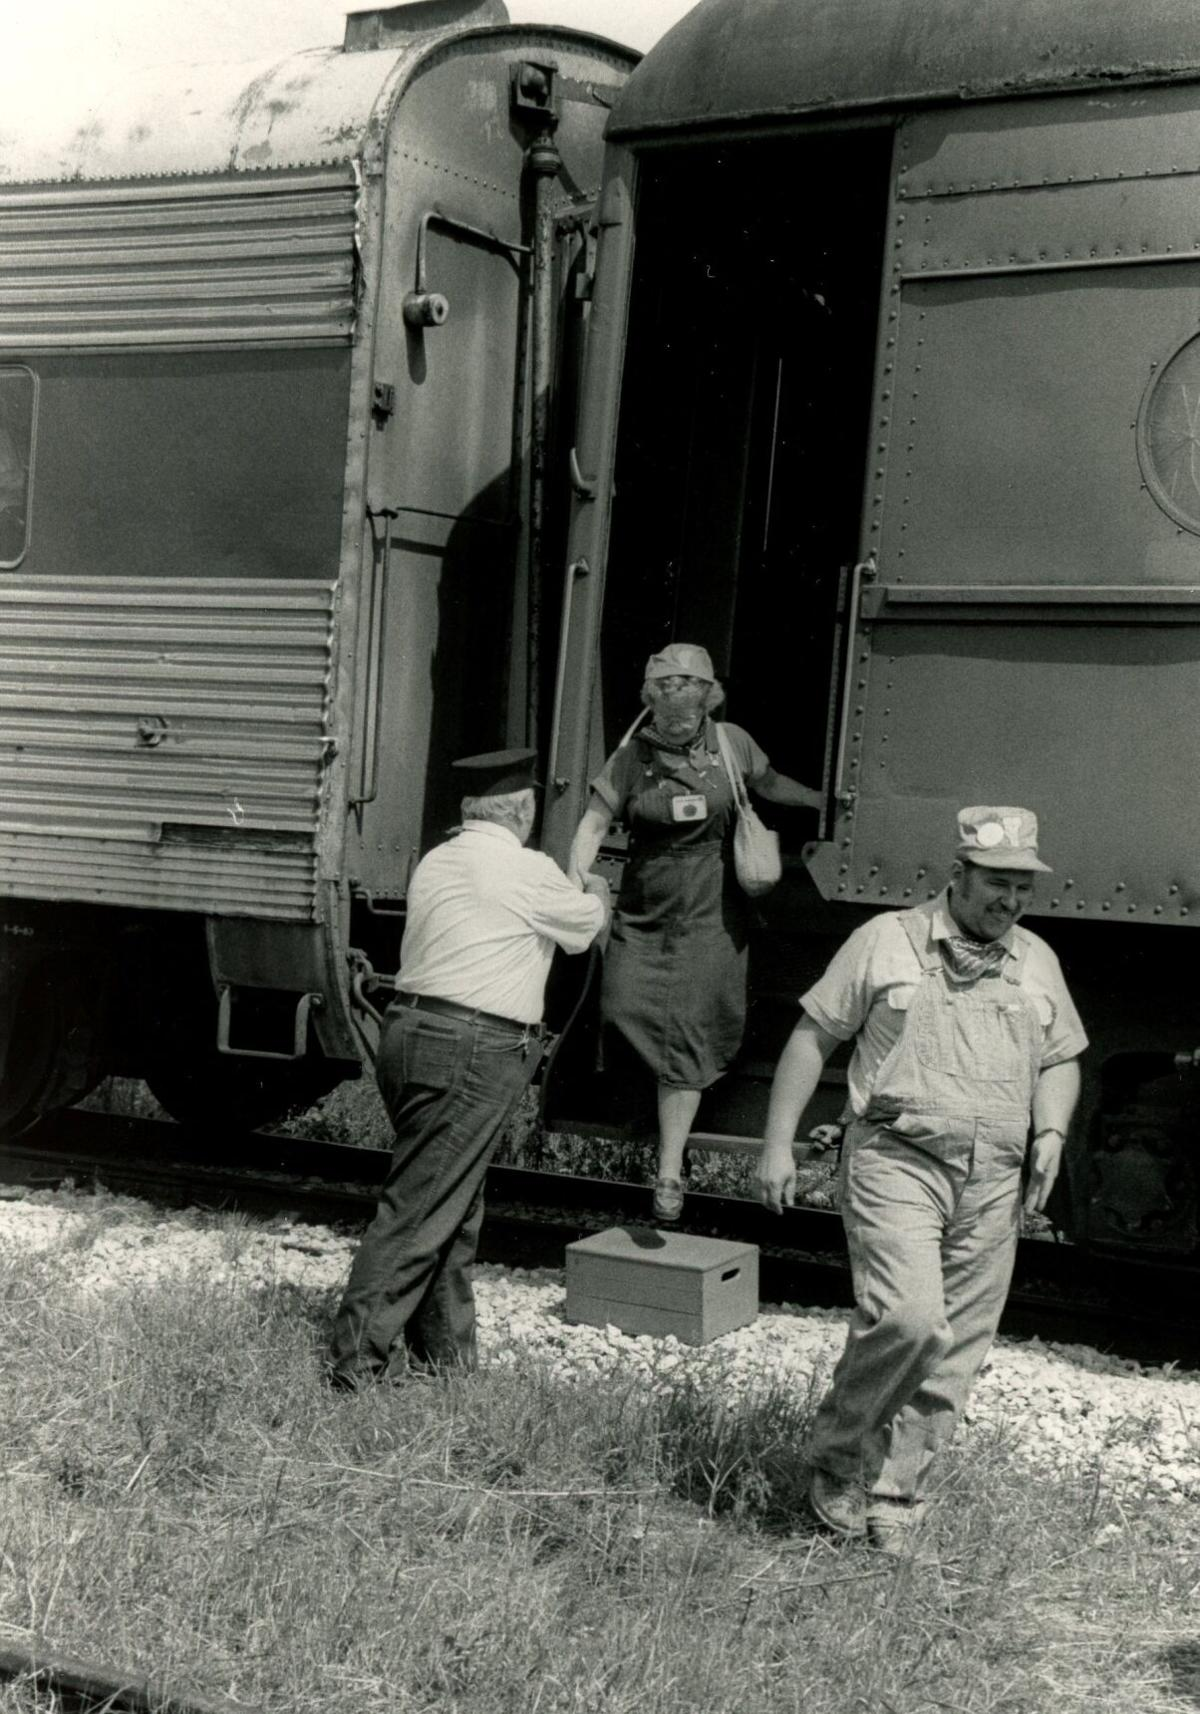 Danville Fair train rides August 14, 1984 Hardwick Gazette photo.jpg